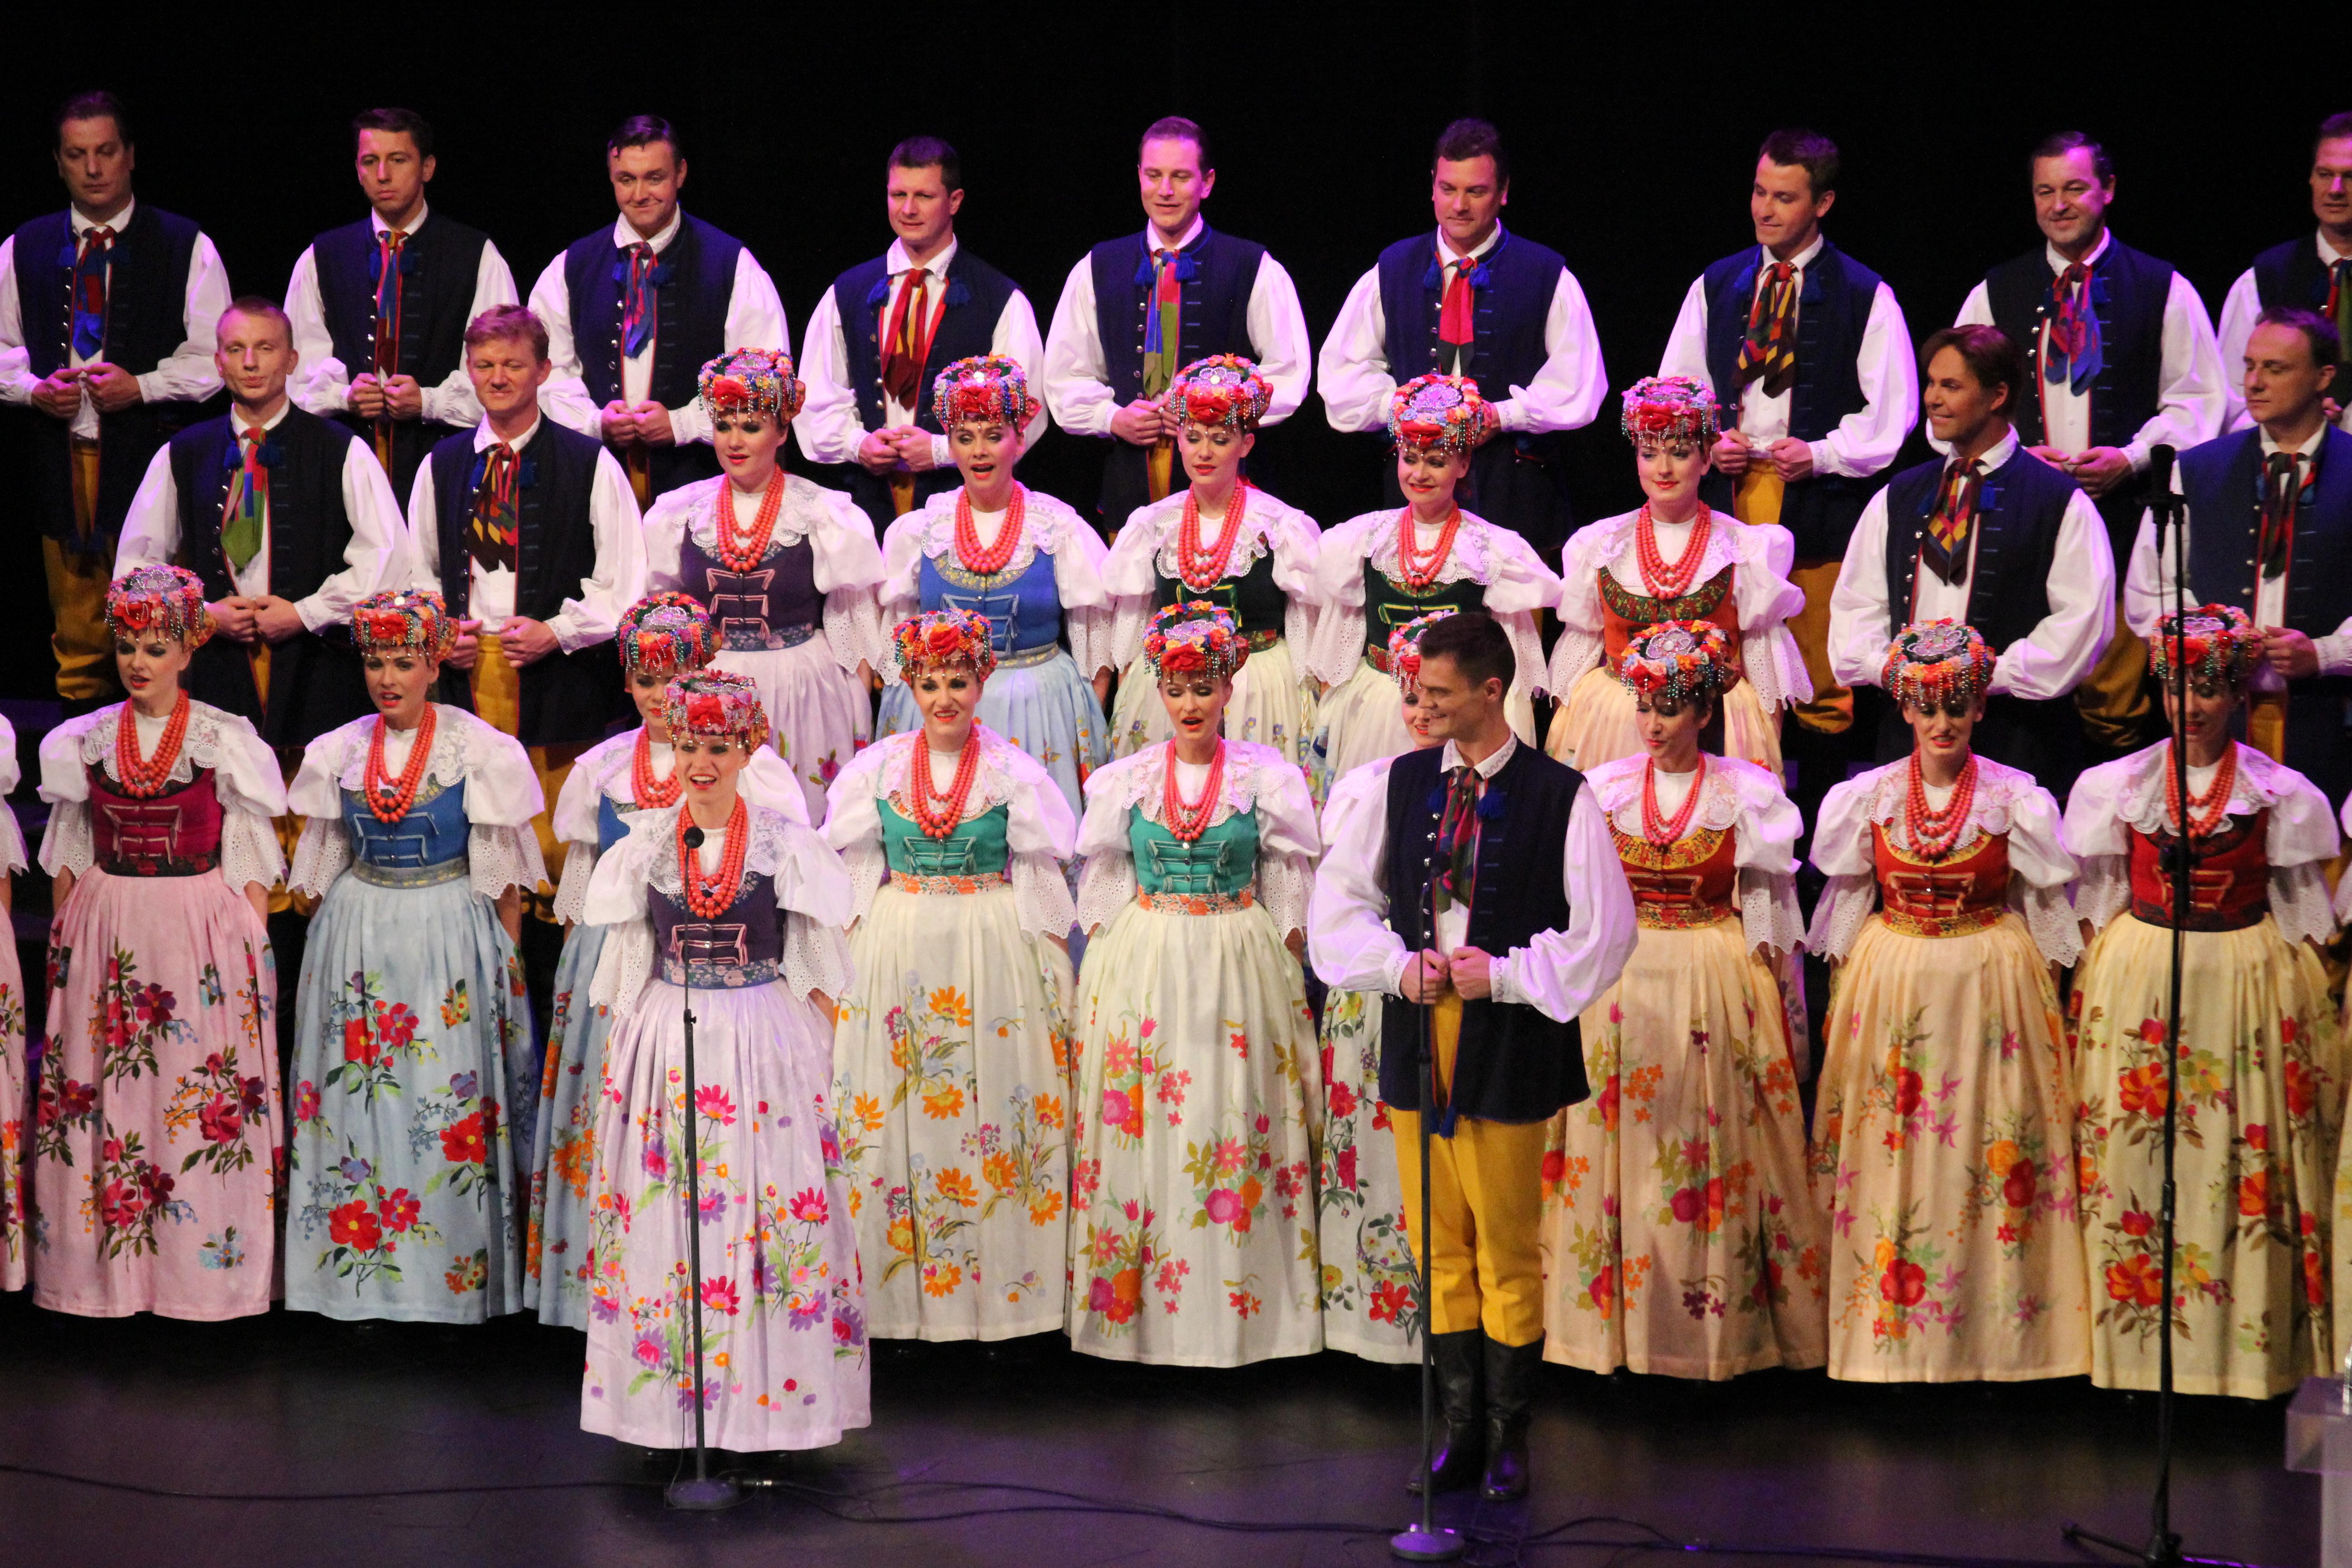 2015_09_21_IMG_MMP_Chorzów_0553